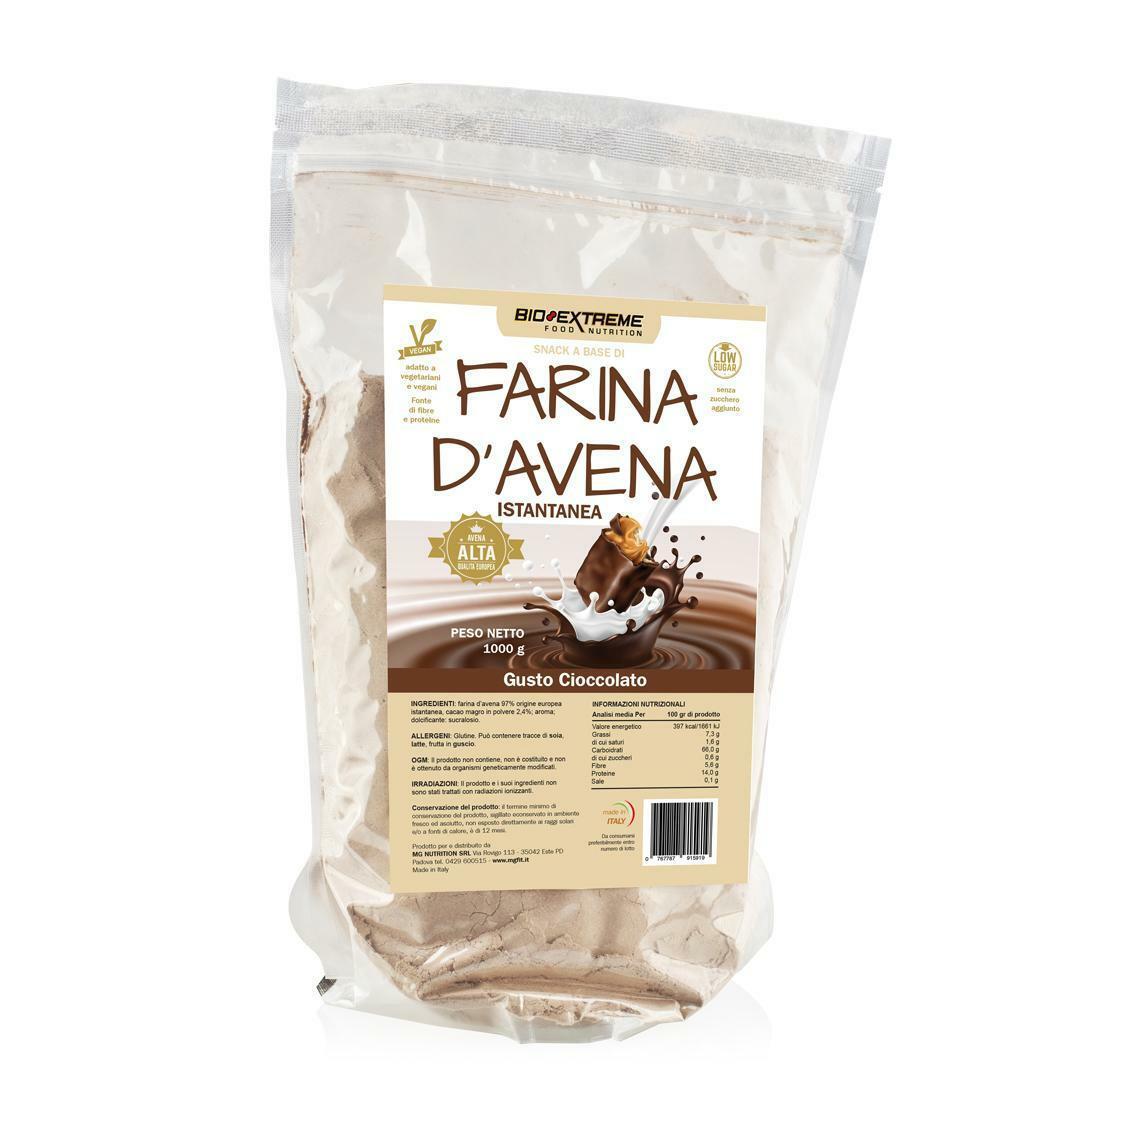 bio extreme oat flour - farina d'avena istantanea gusto cacao e nocciola - 1kg